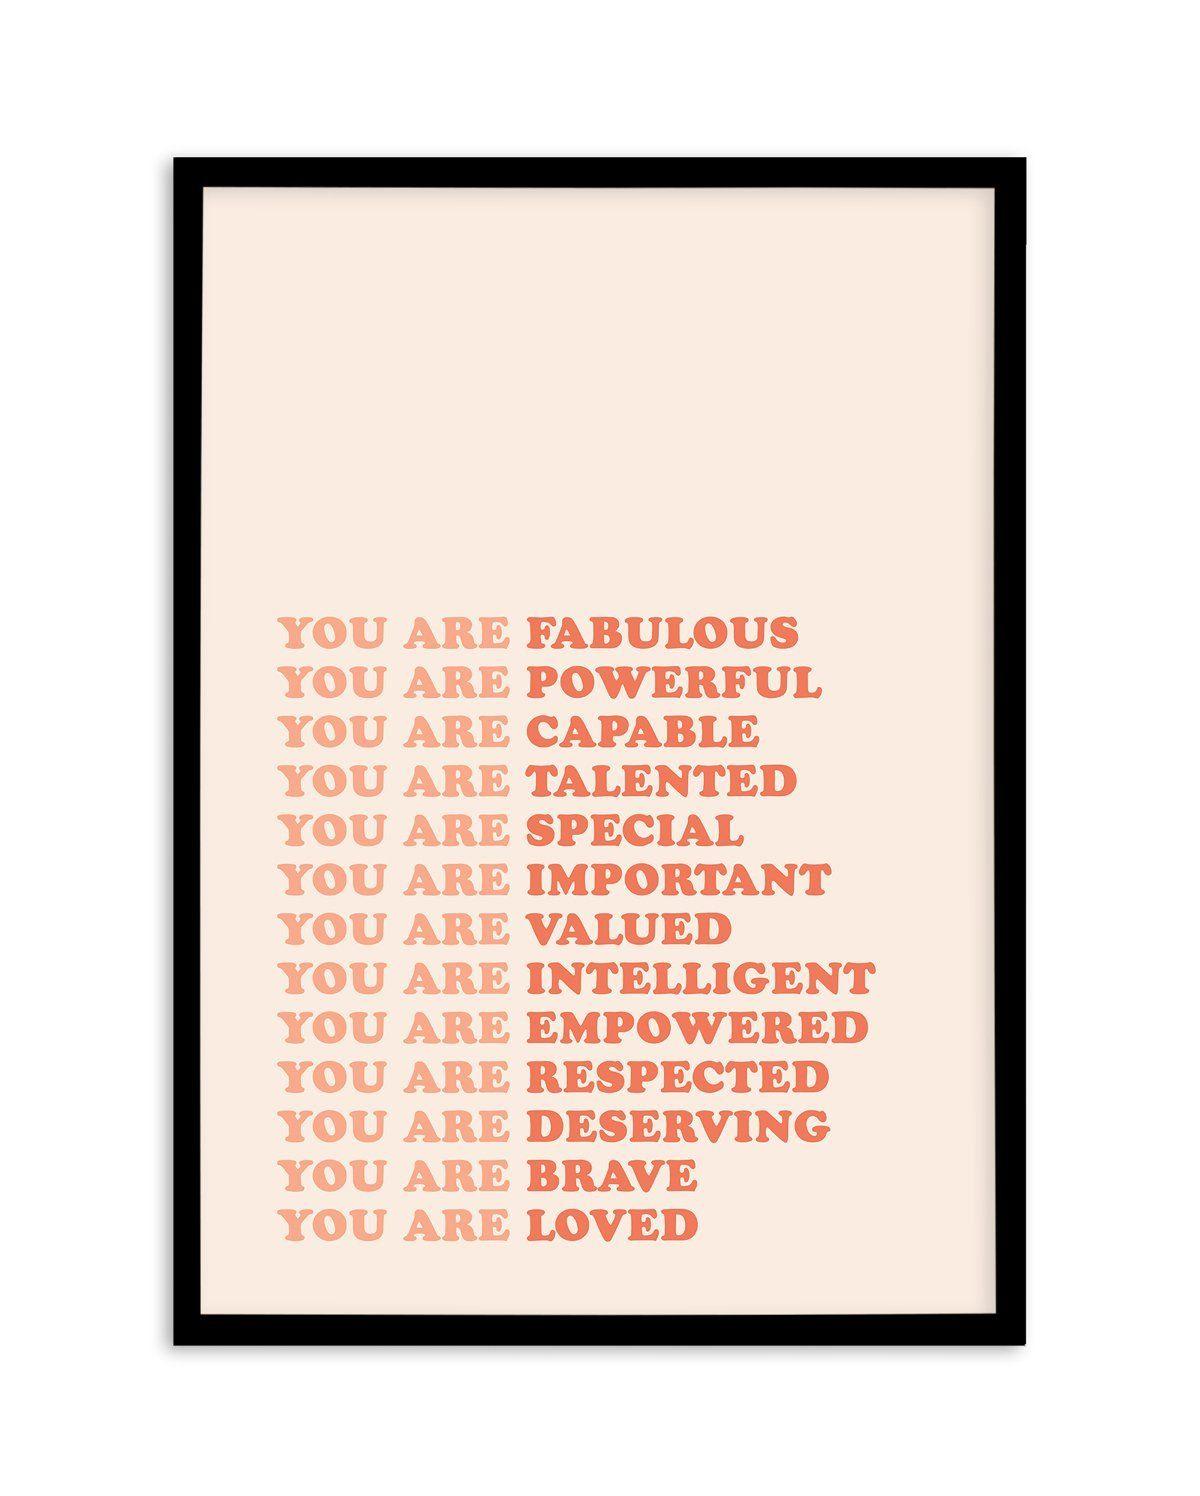 You Are Fabulous - A2 (42cm x 59.4cm | 23.4 x 16.5 | 420mm x 594mm) / Black